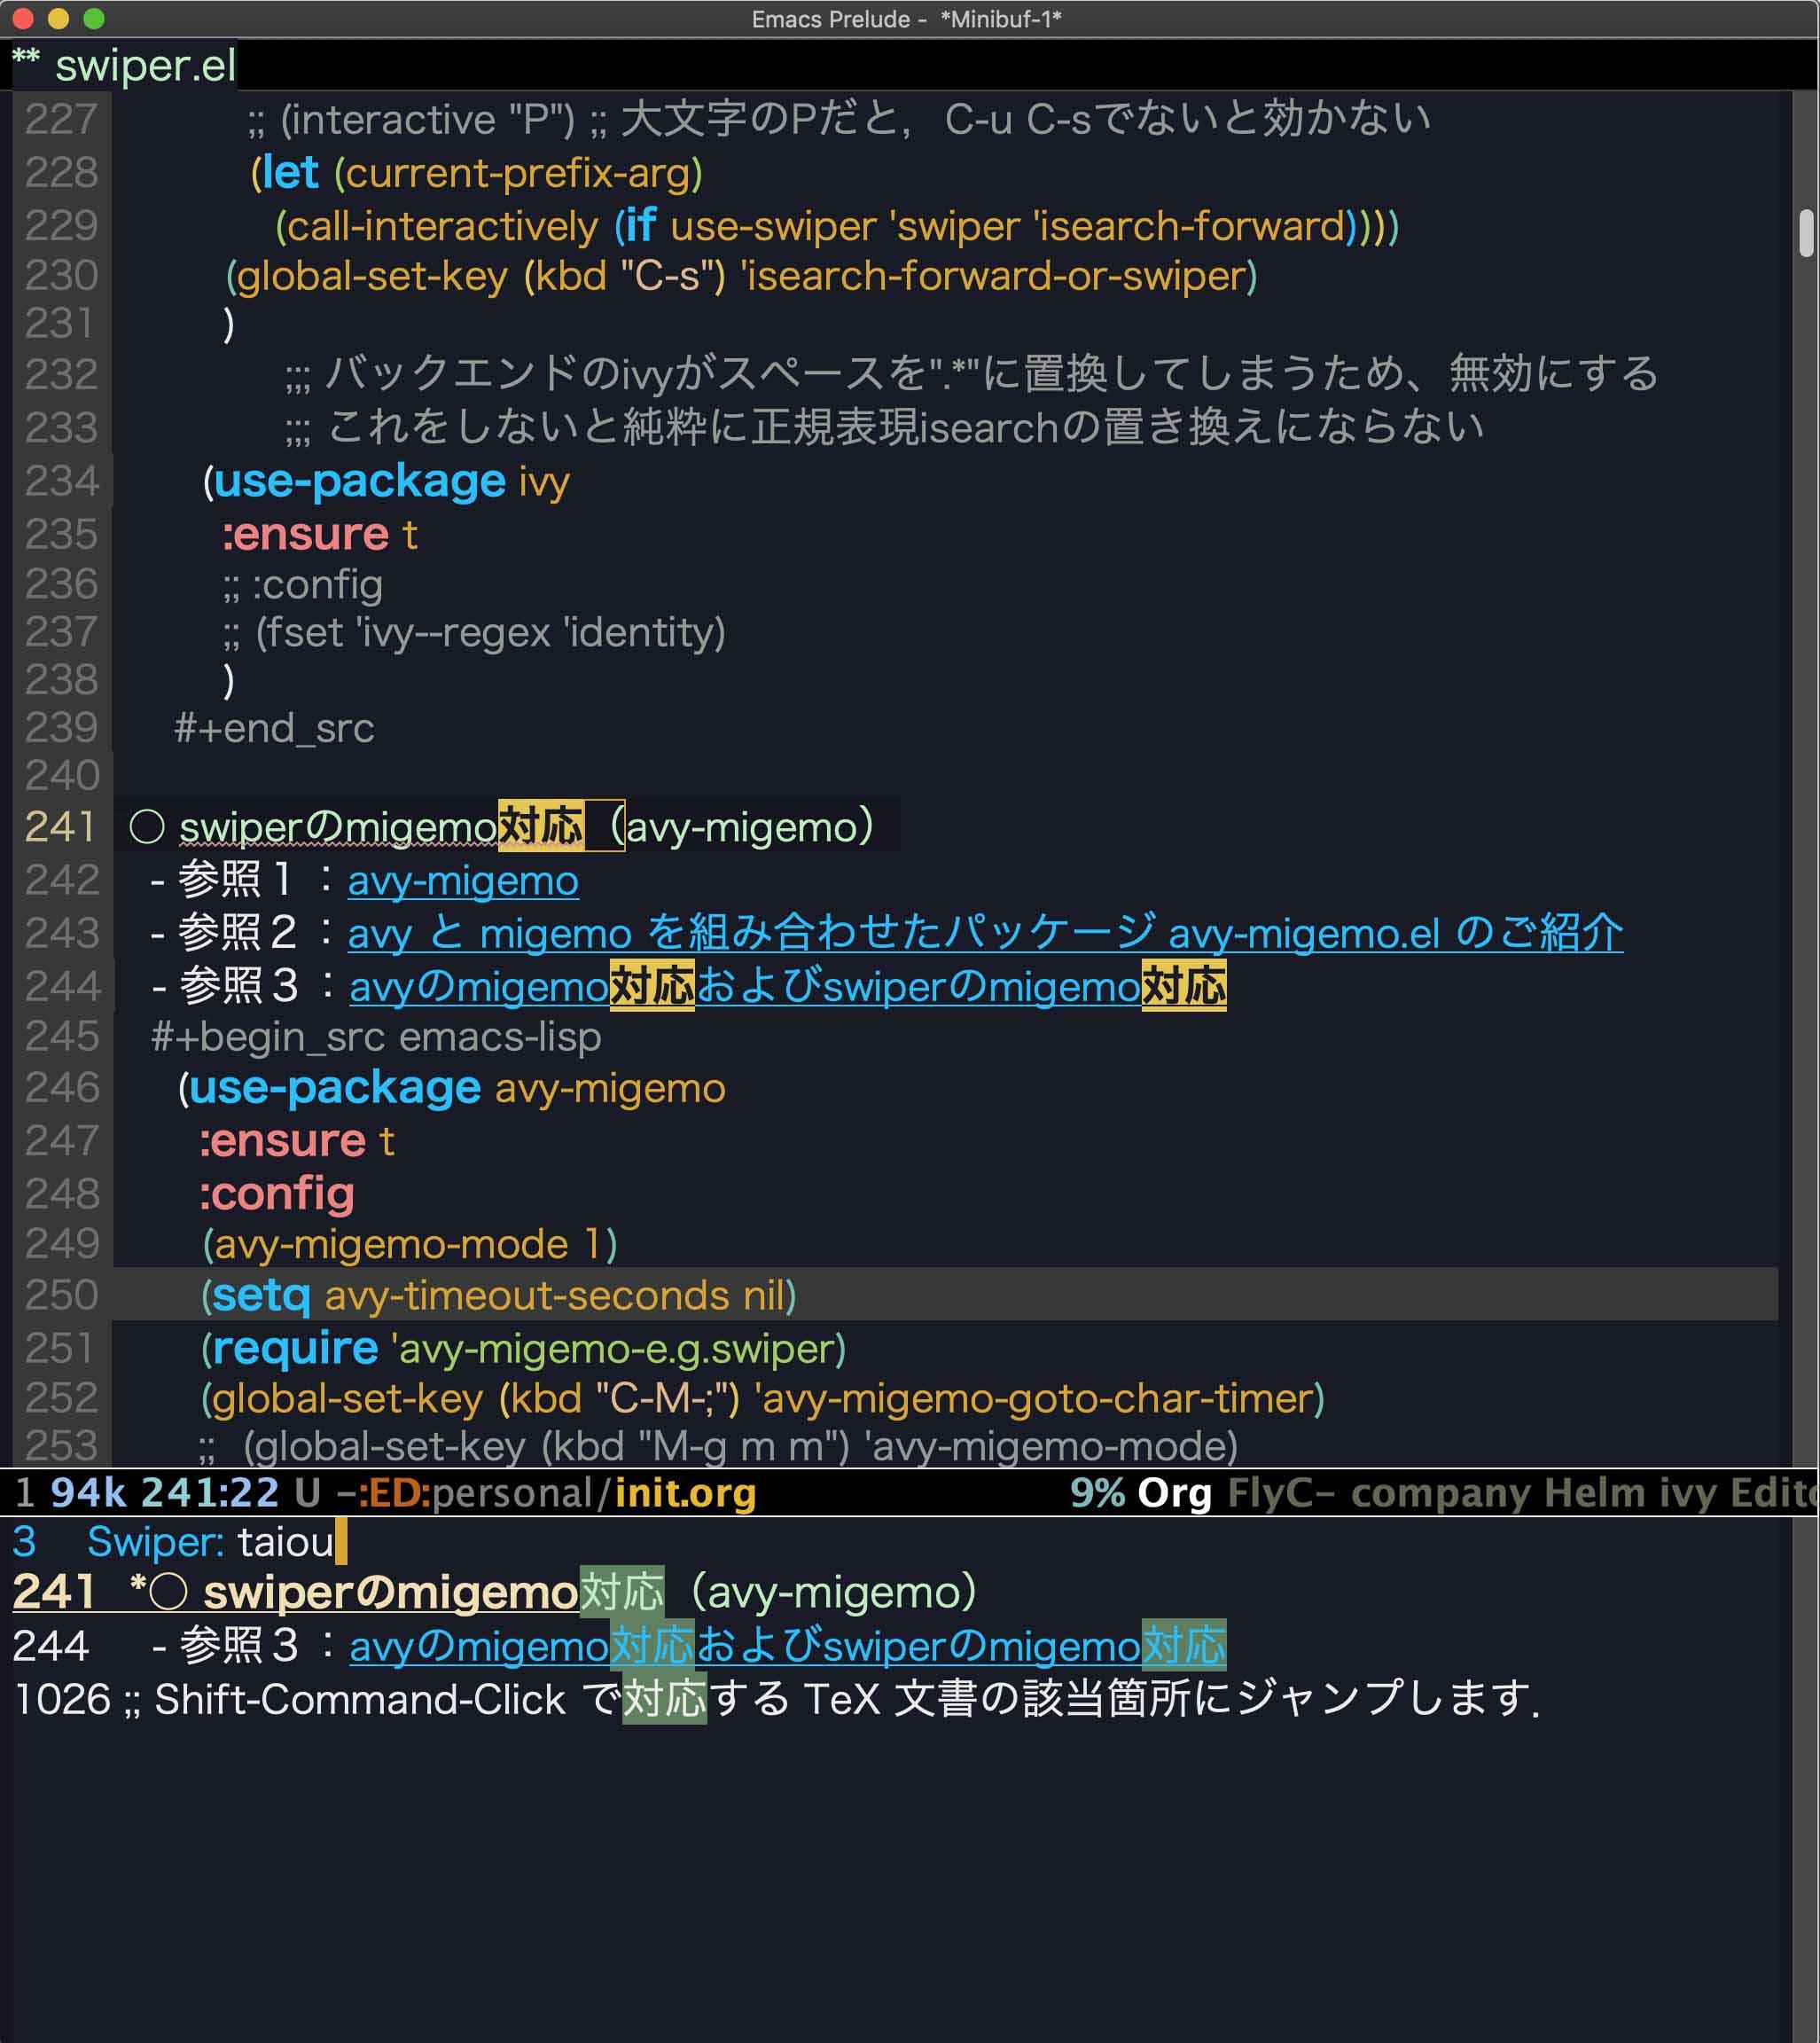 Gleanings (display-line-numbers, whitespace-mode